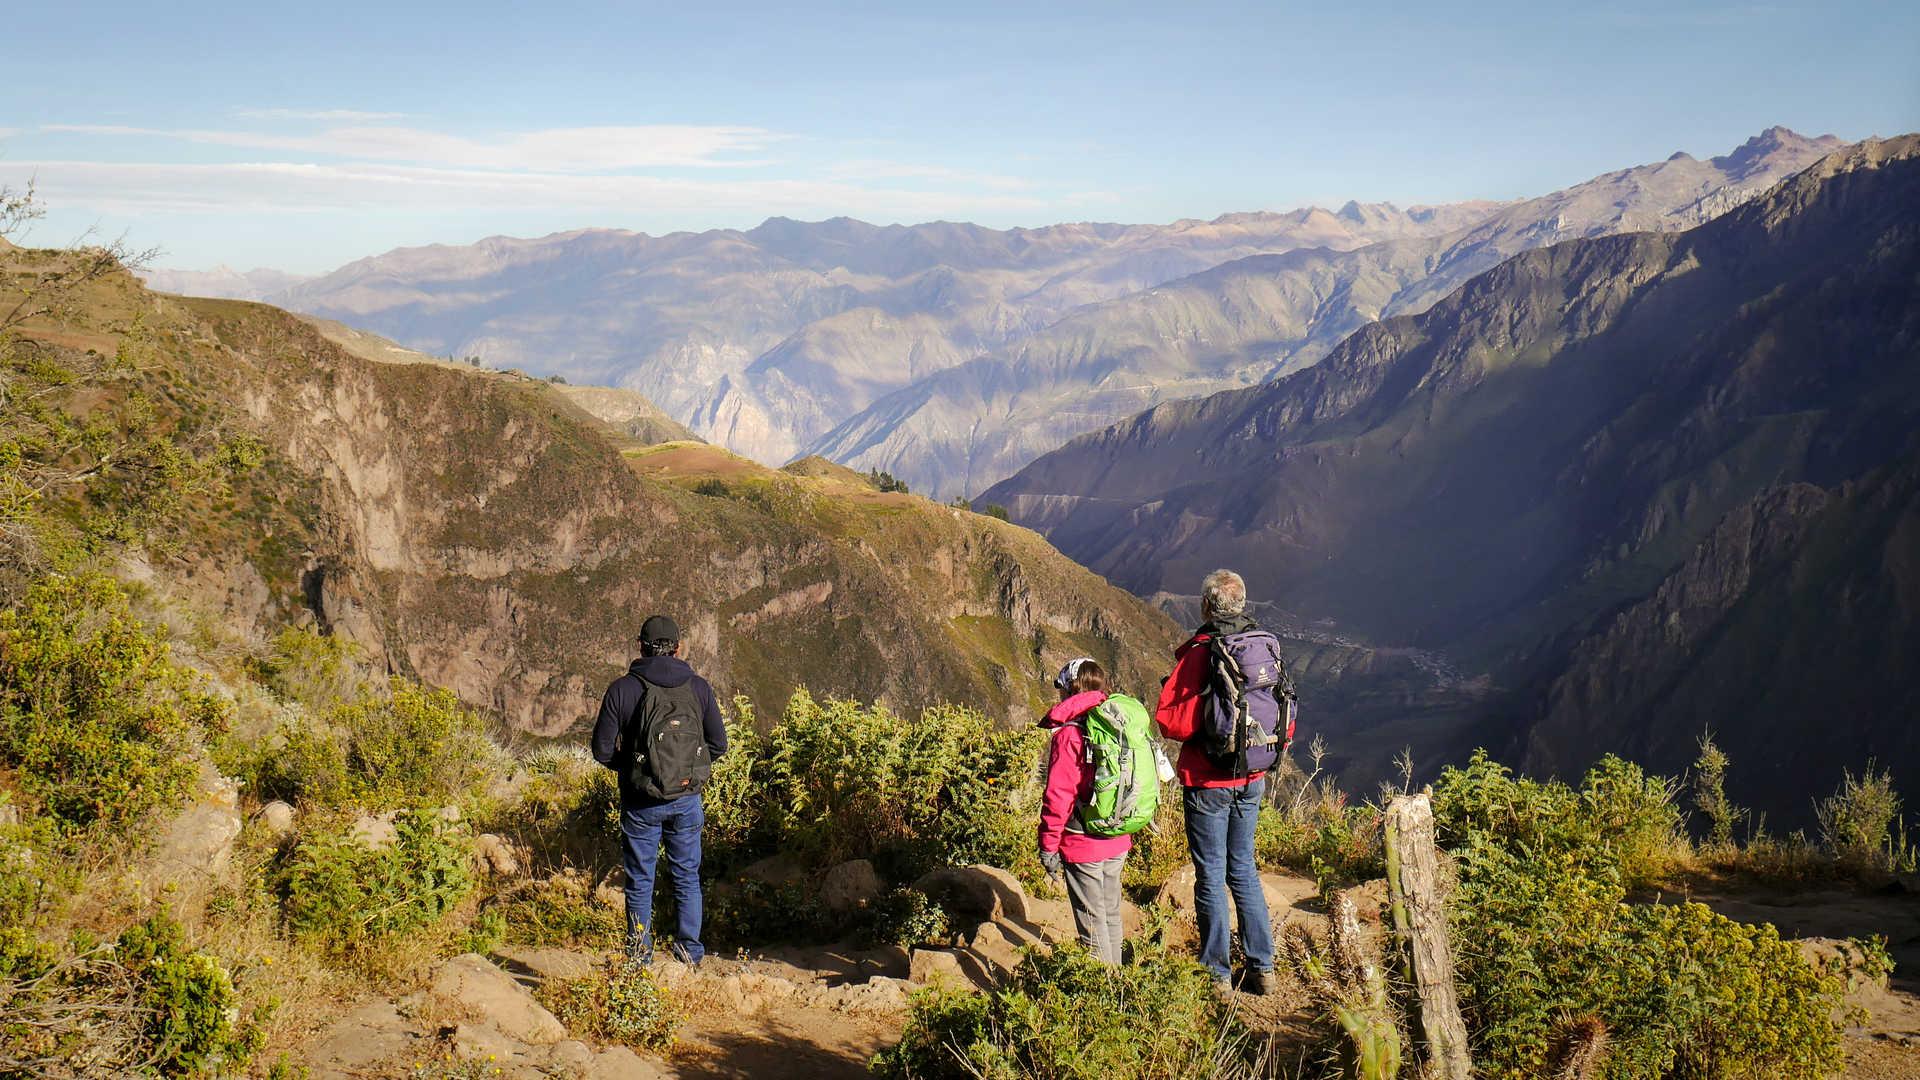 Randonneurs admirant la vue du canyon de Colca